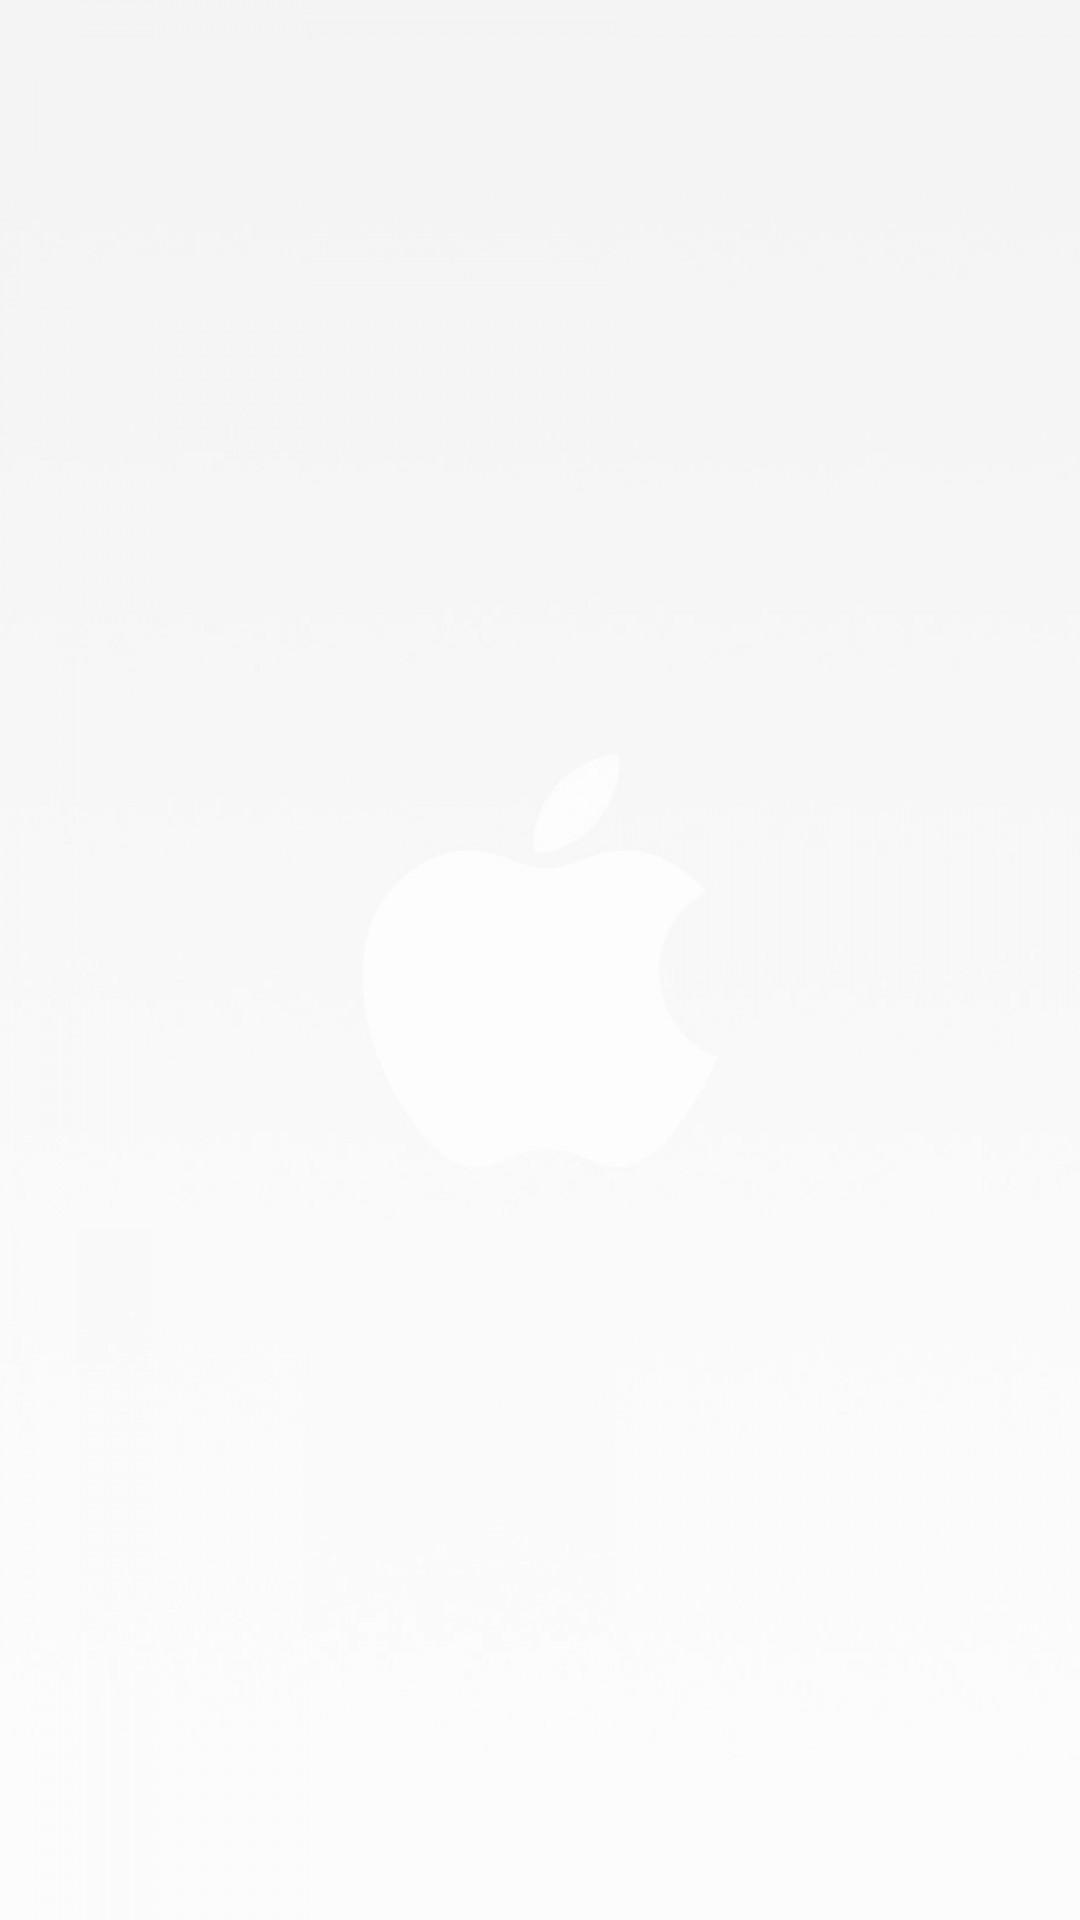 Pure White Background White Iphone 6 Plus Wallpaper 1080x1920